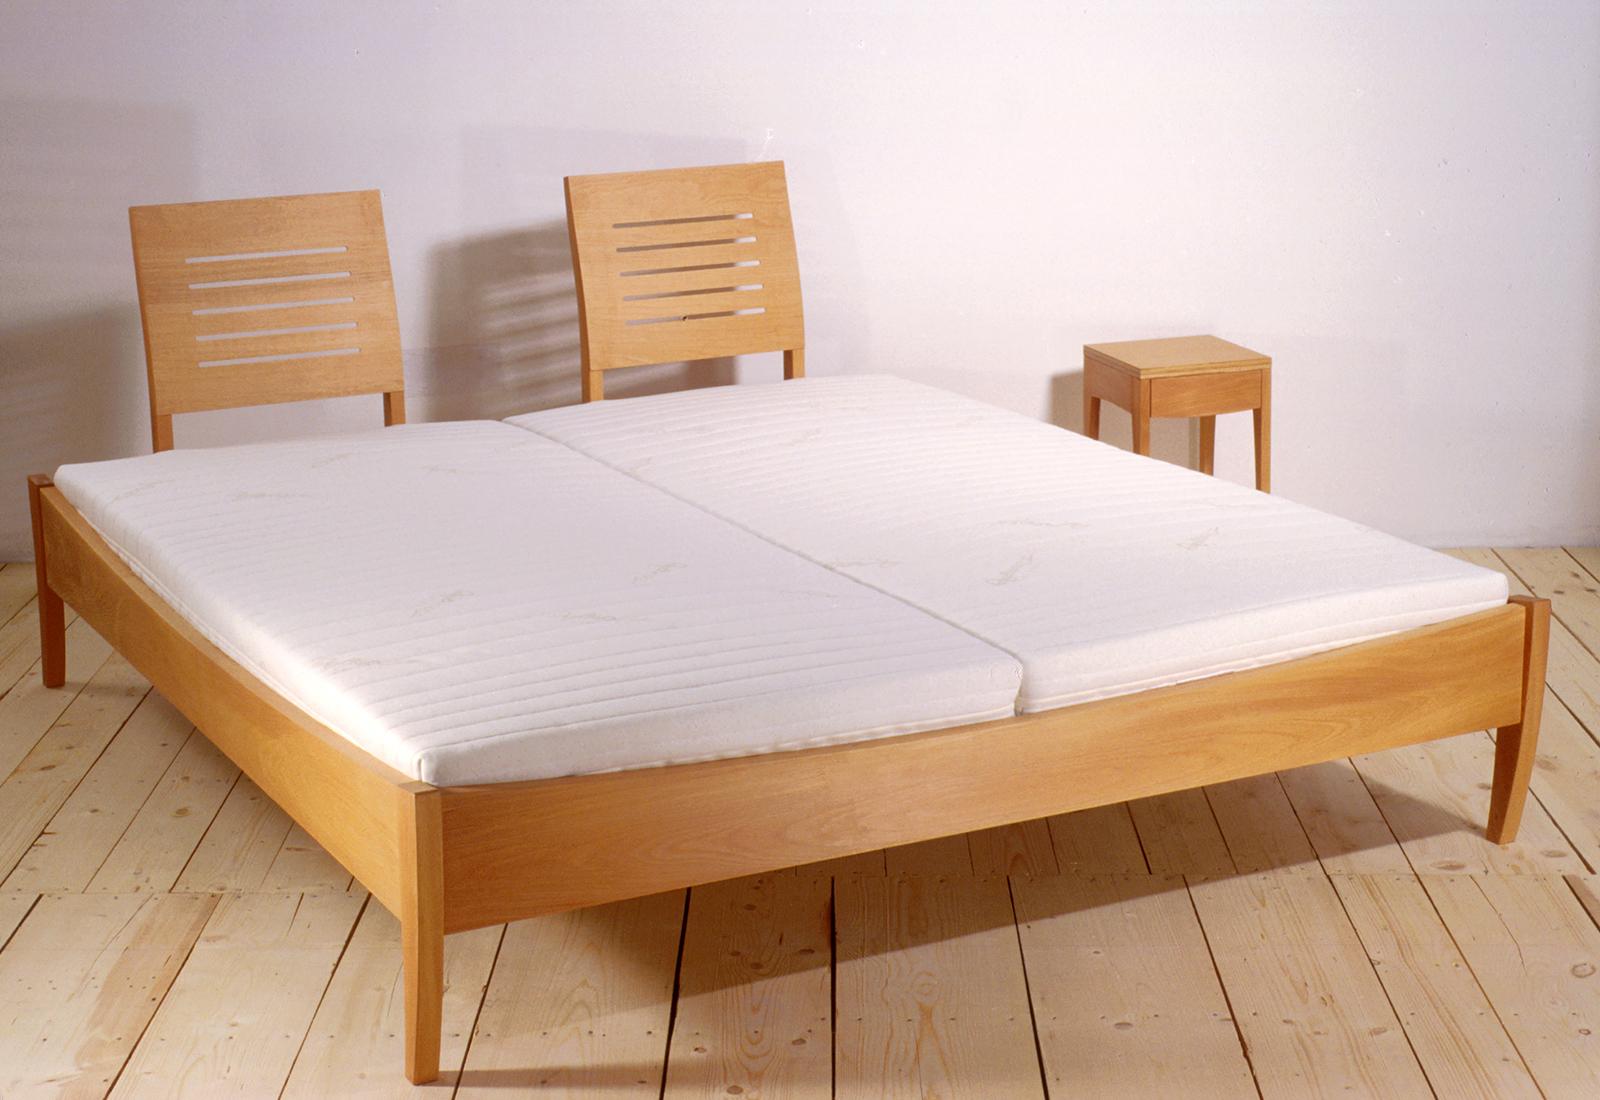 GRASSHOPPER bed